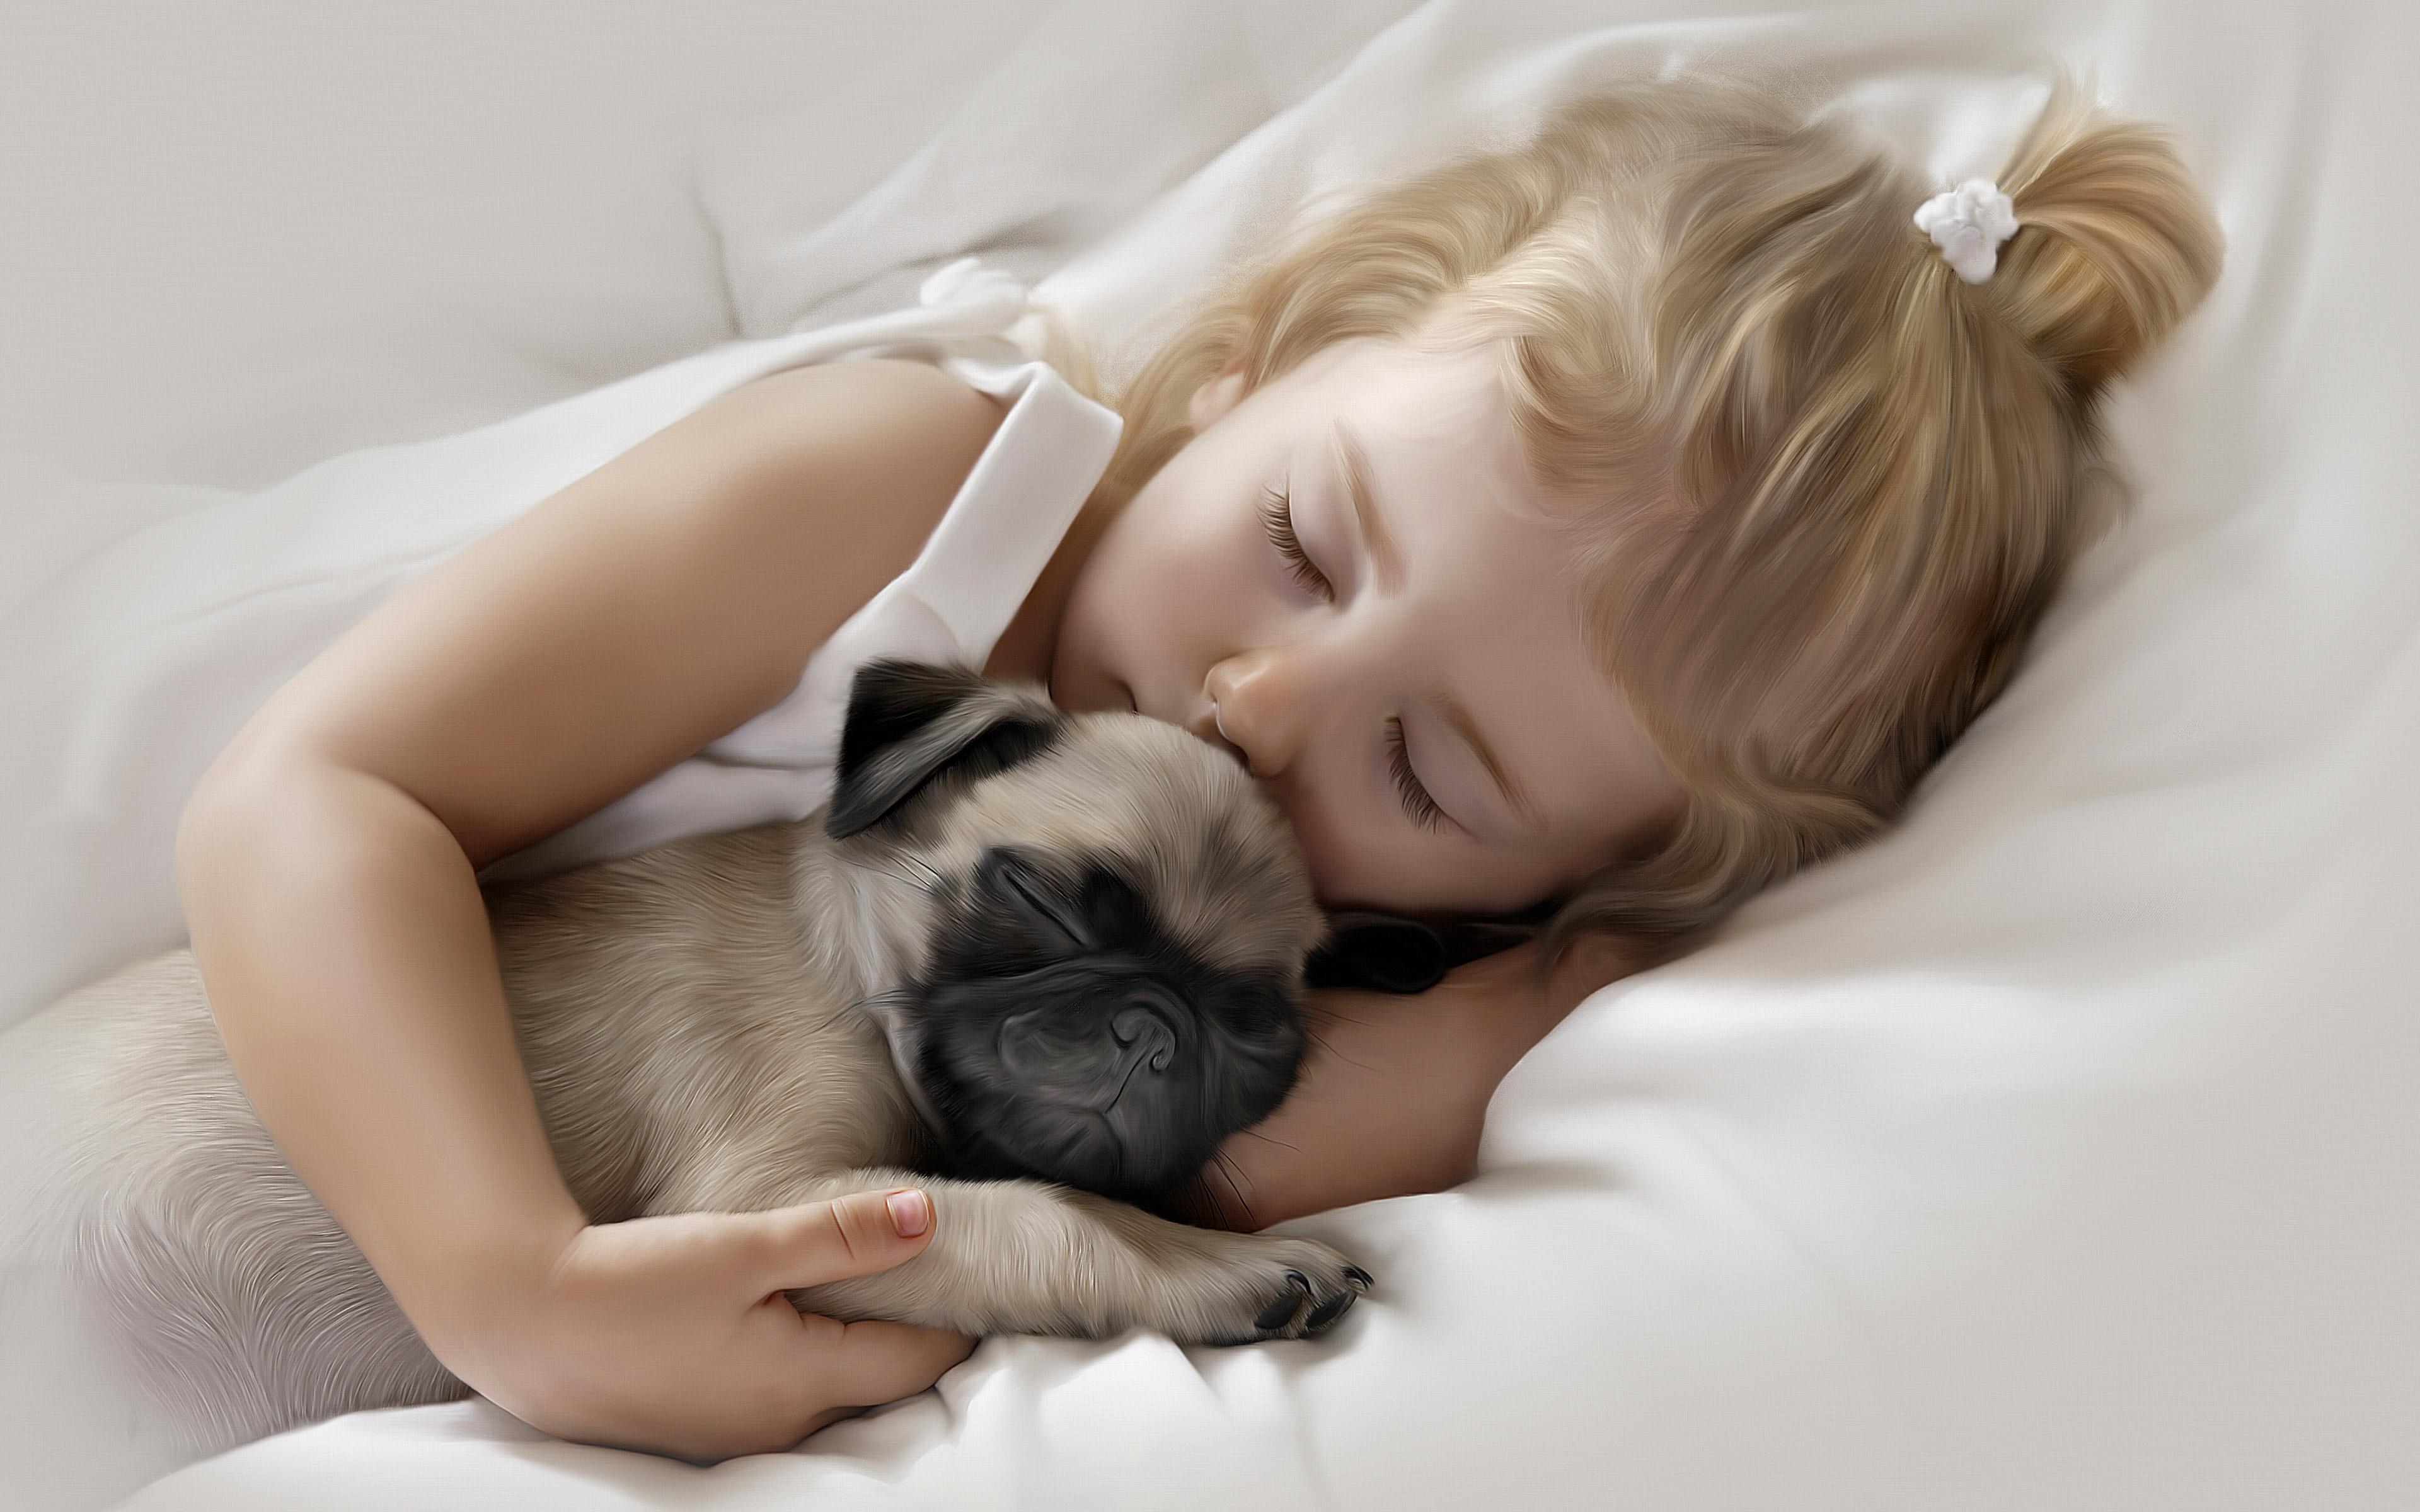 https://s1.1zoom.me/b5050/764/Dogs_Pug_Two_Sleep_Little_girls_Cute_520471_3840x2400.jpg